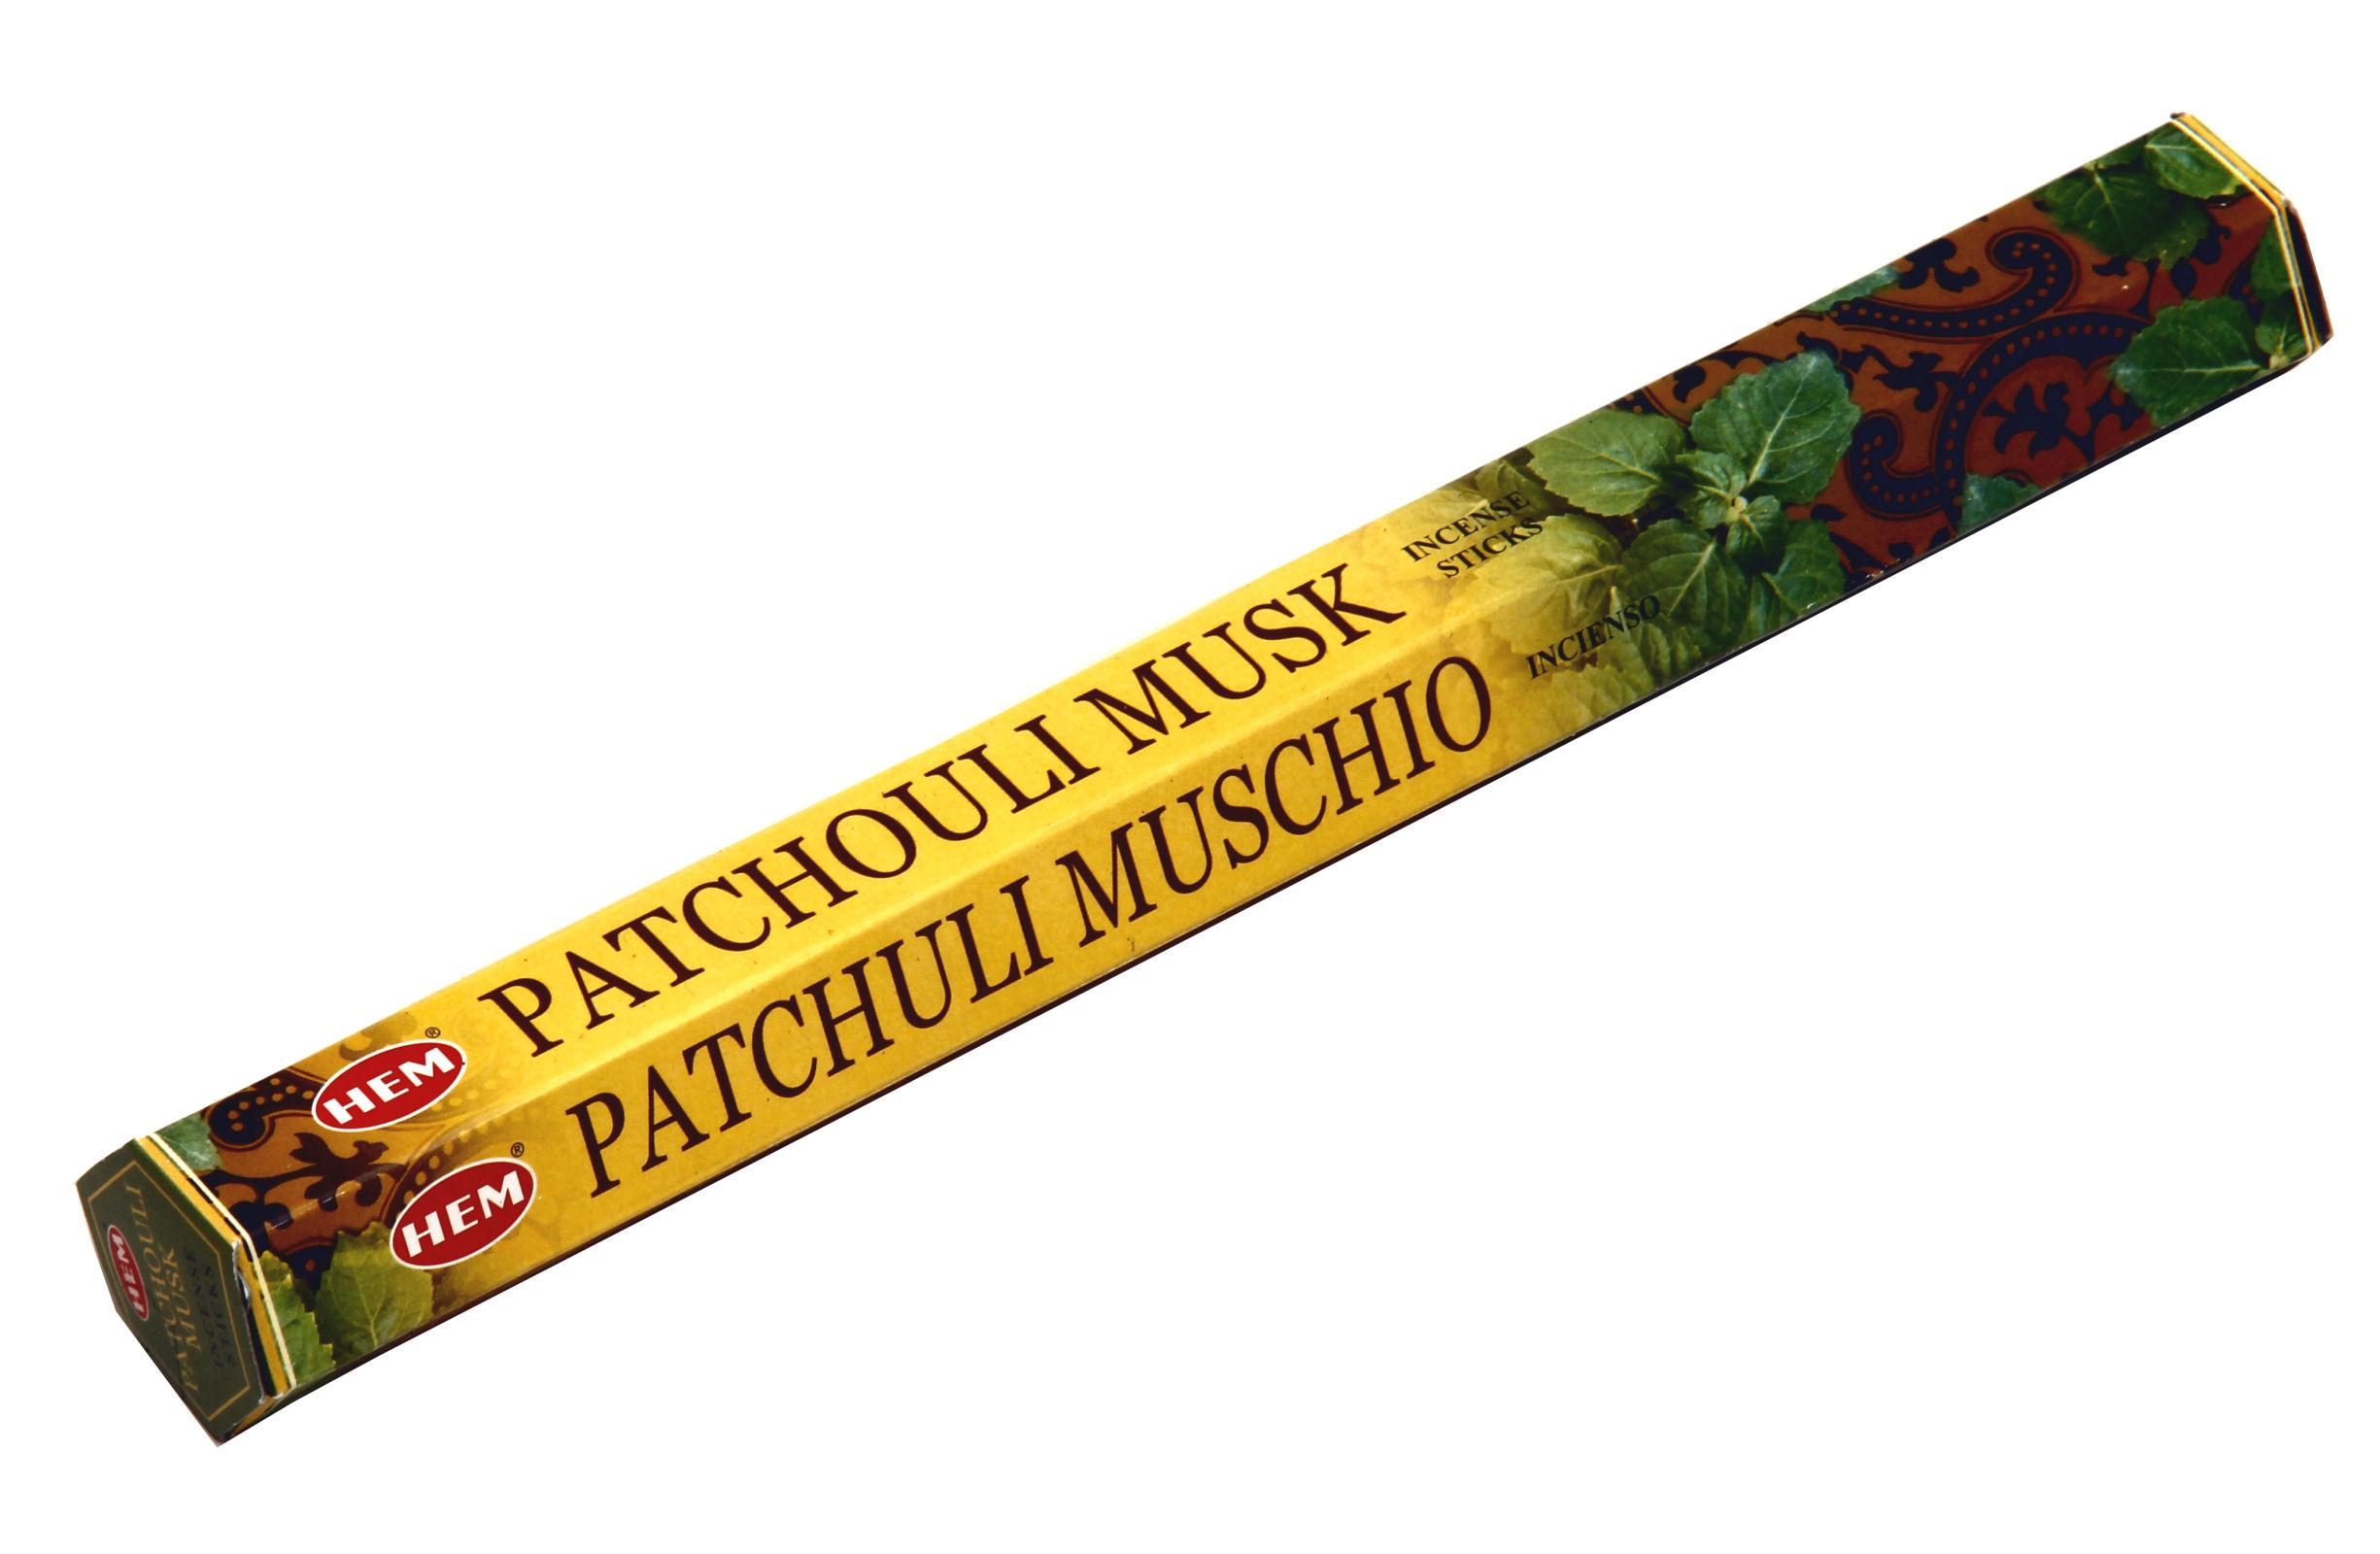 HEM Räucherstäbchen Patchouli Musk 20g Hexa Packung  Ca. 20 Incence Sticks